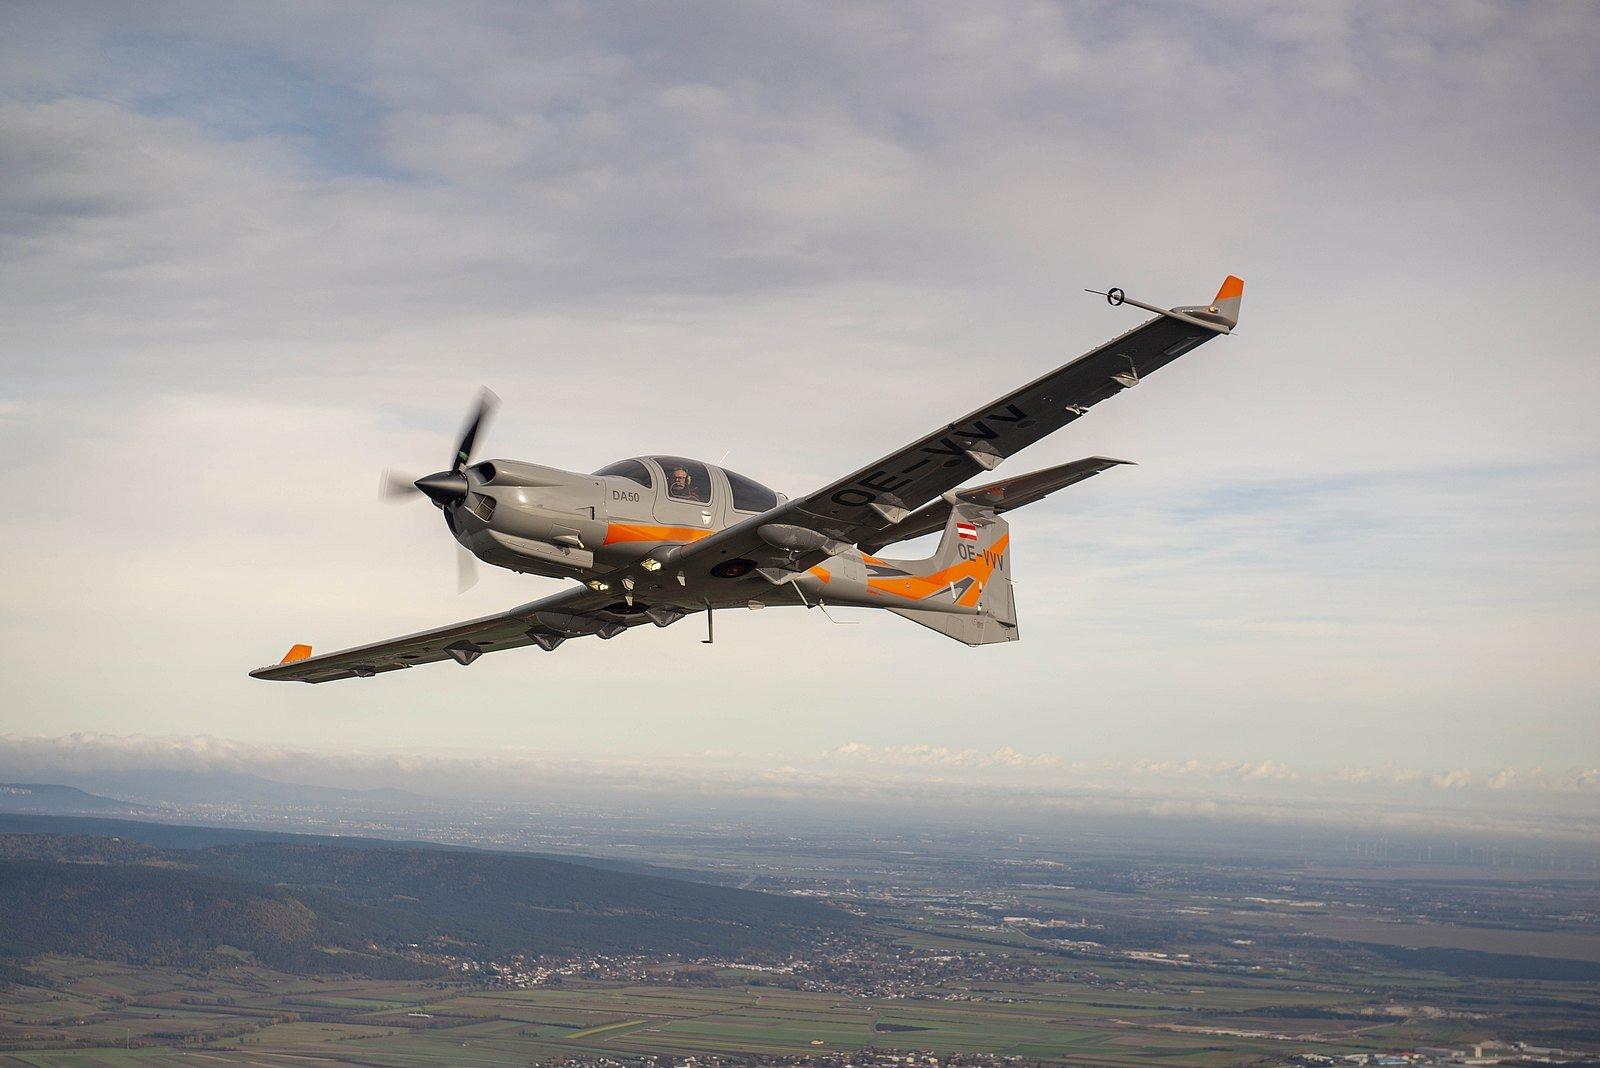 DA50 RG - Be Unique! - Diamond Aircraft Industries